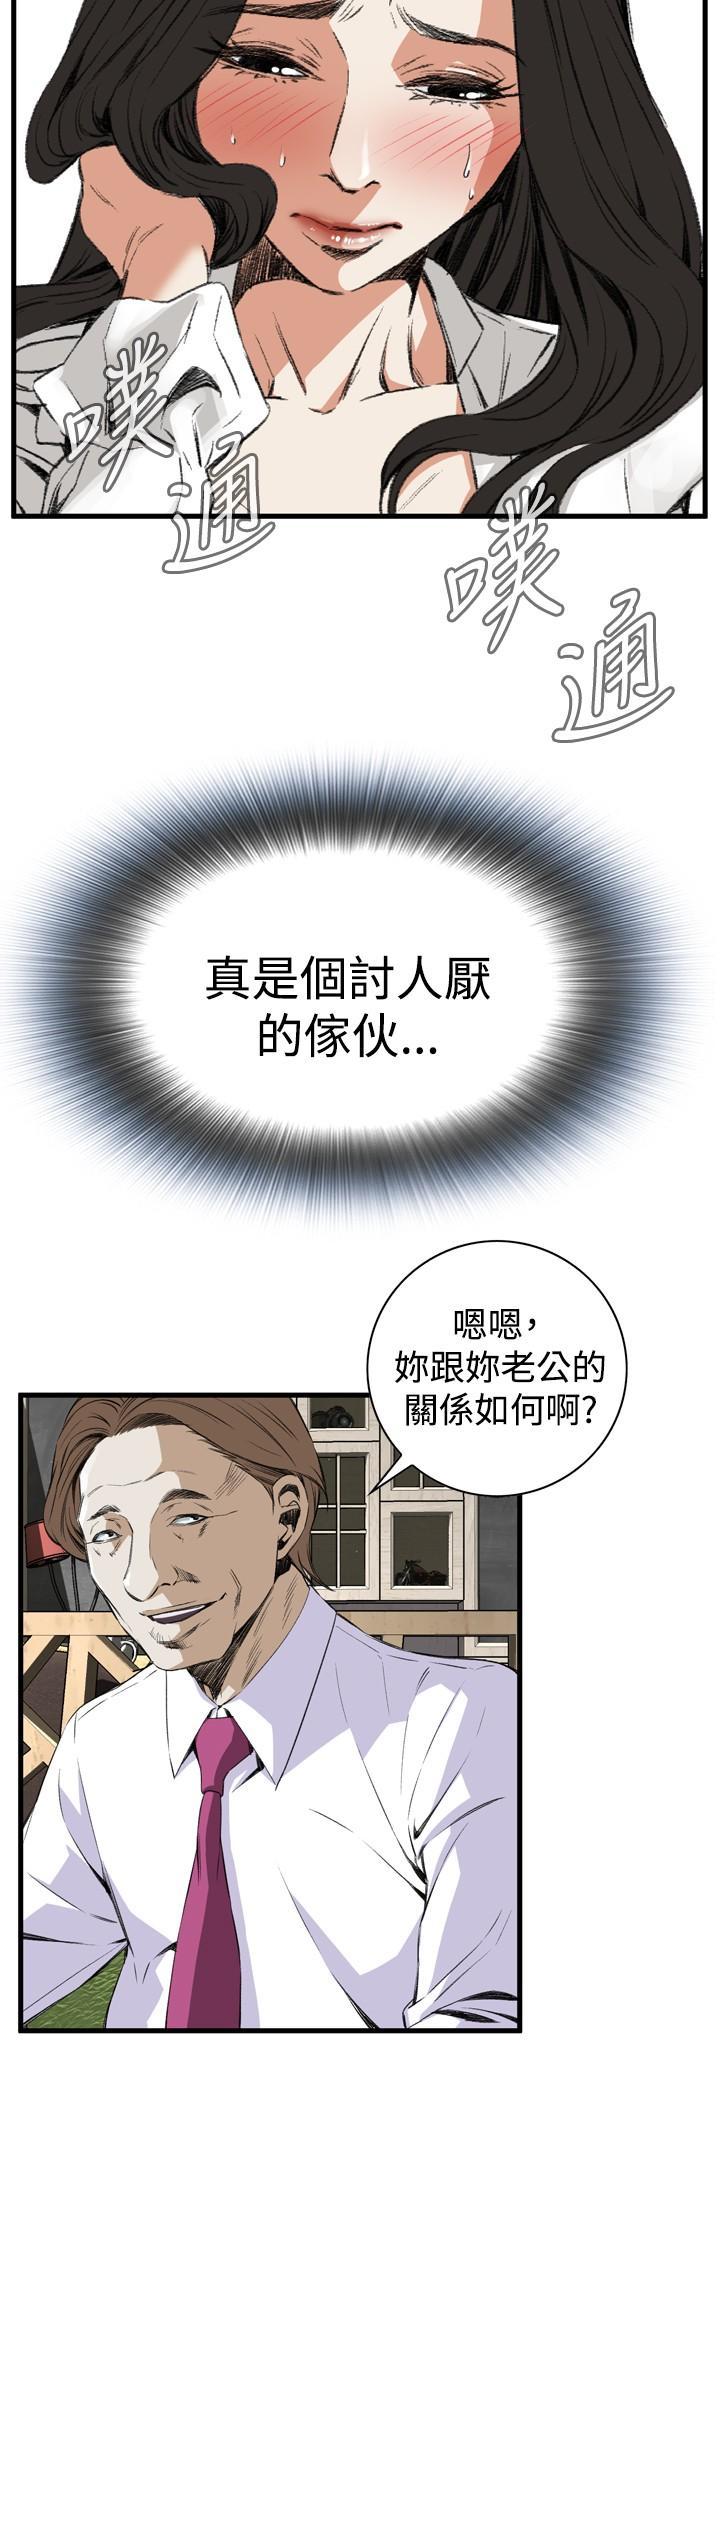 Take a Peek 偷窥 Ch.39~60 [Chinese]中文 263